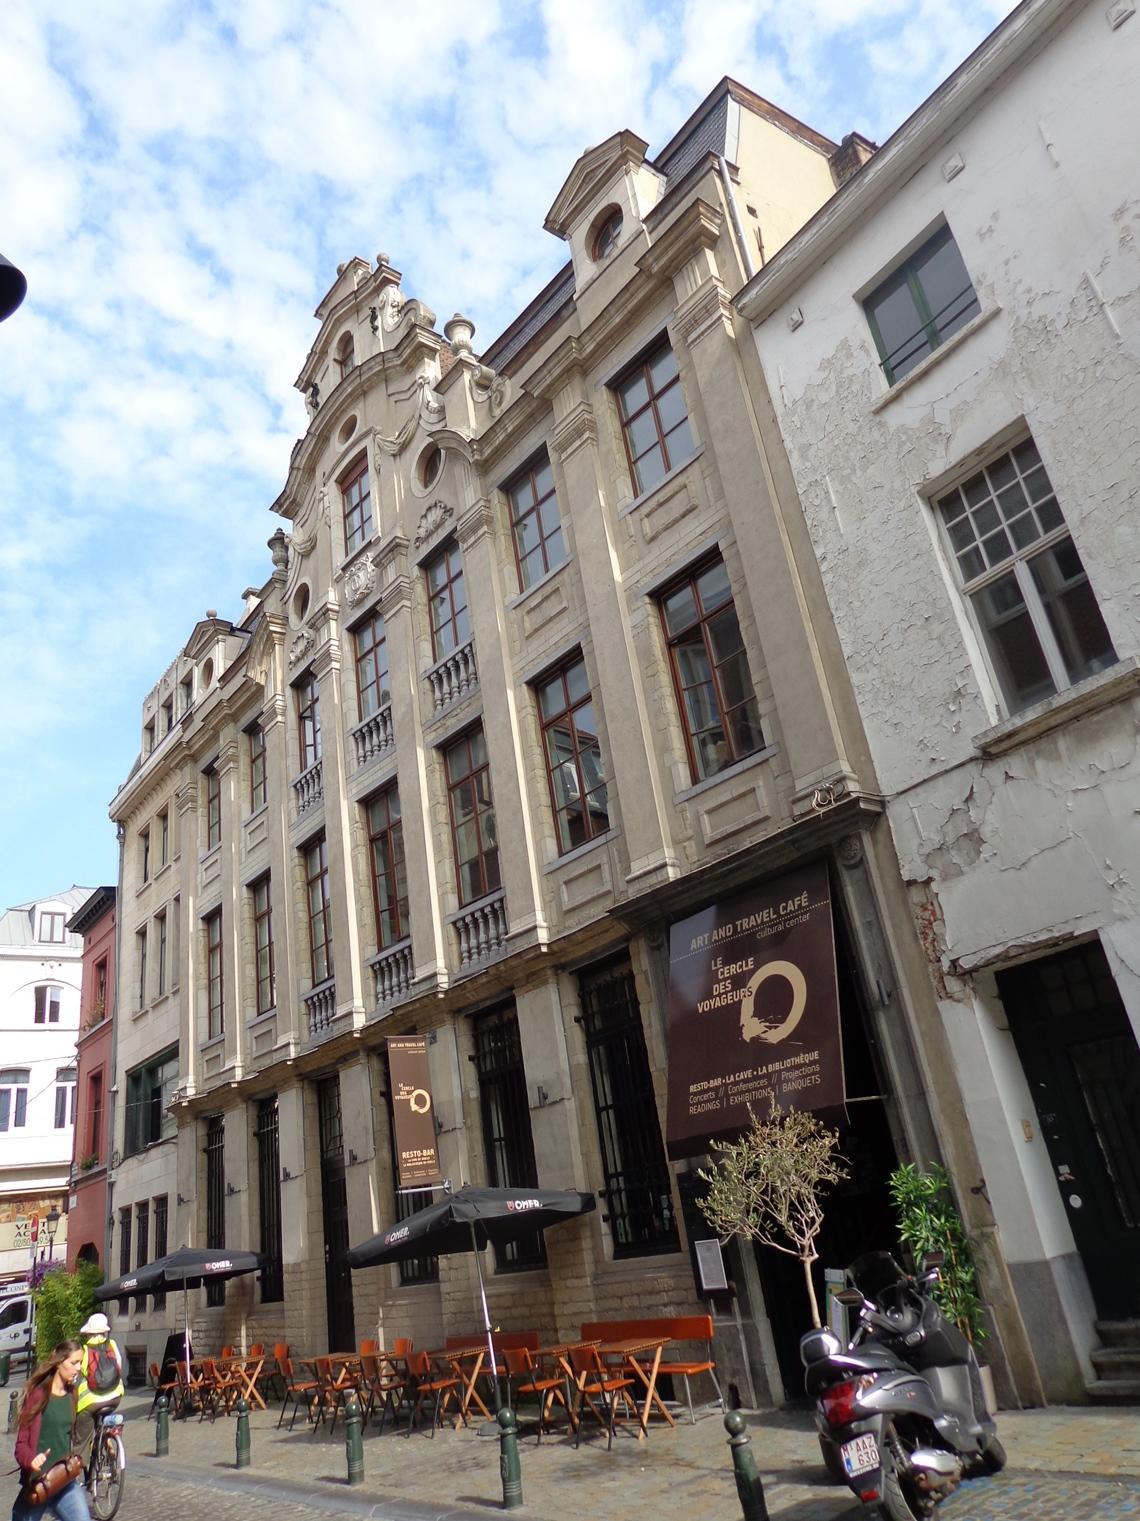 Lievevrouwbroersstraat 16-18, 2015